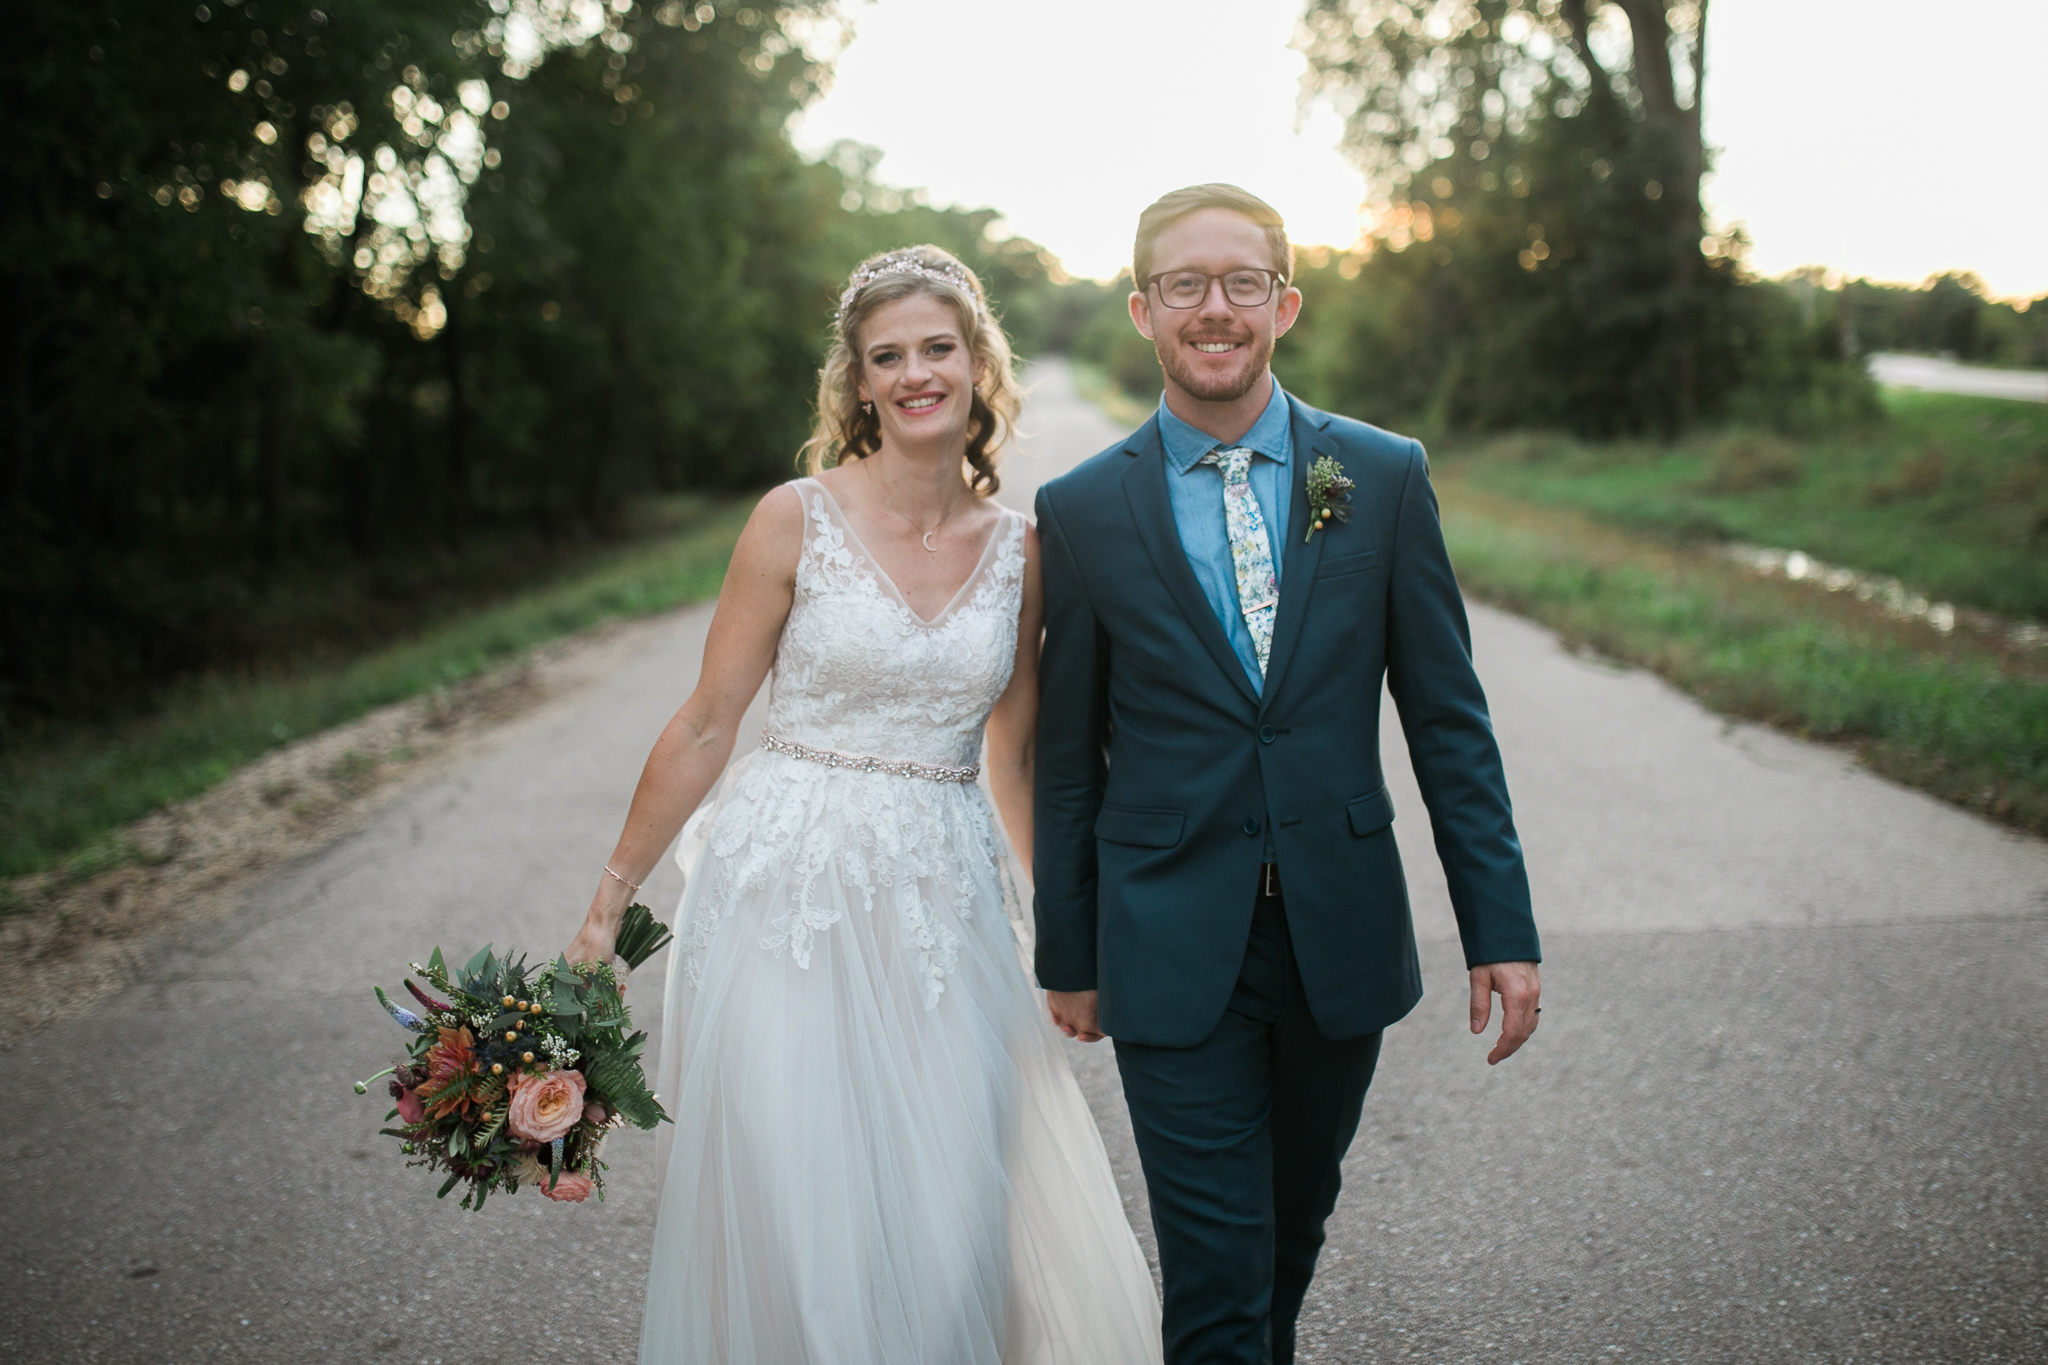 Paoli-Mill-wedding-summer-Wisconsin_179.jpg